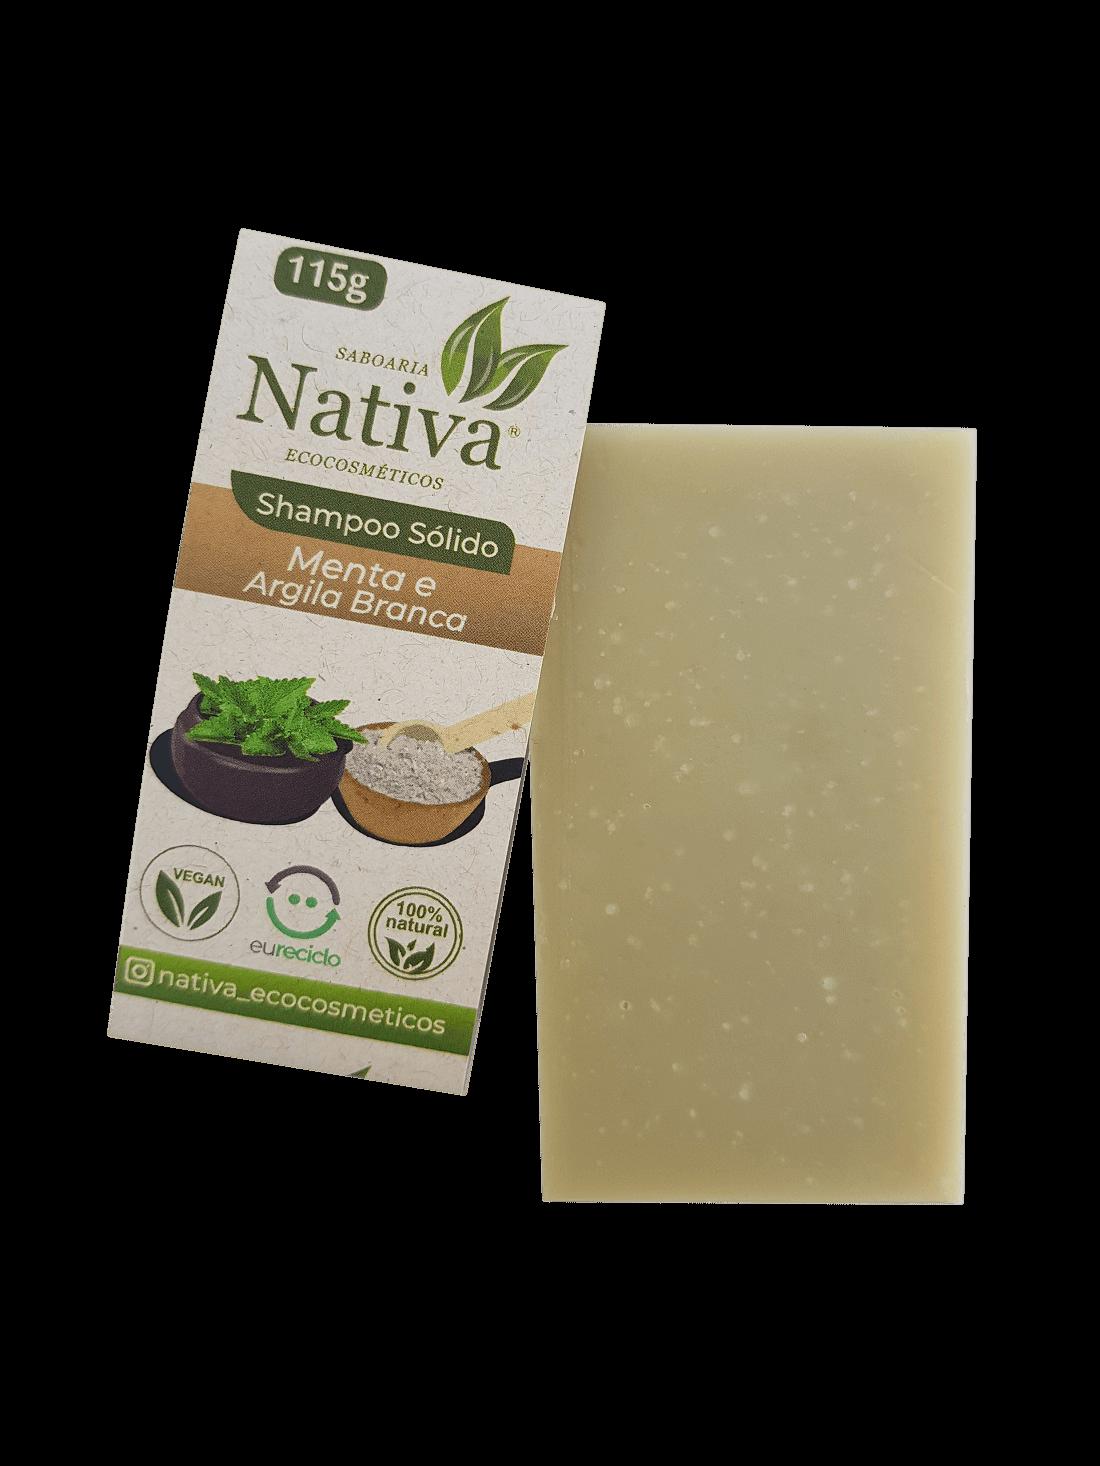 Shampoo Sólido- Menta e Argila Branca  - Saboaria Nativa Ecocosméticos